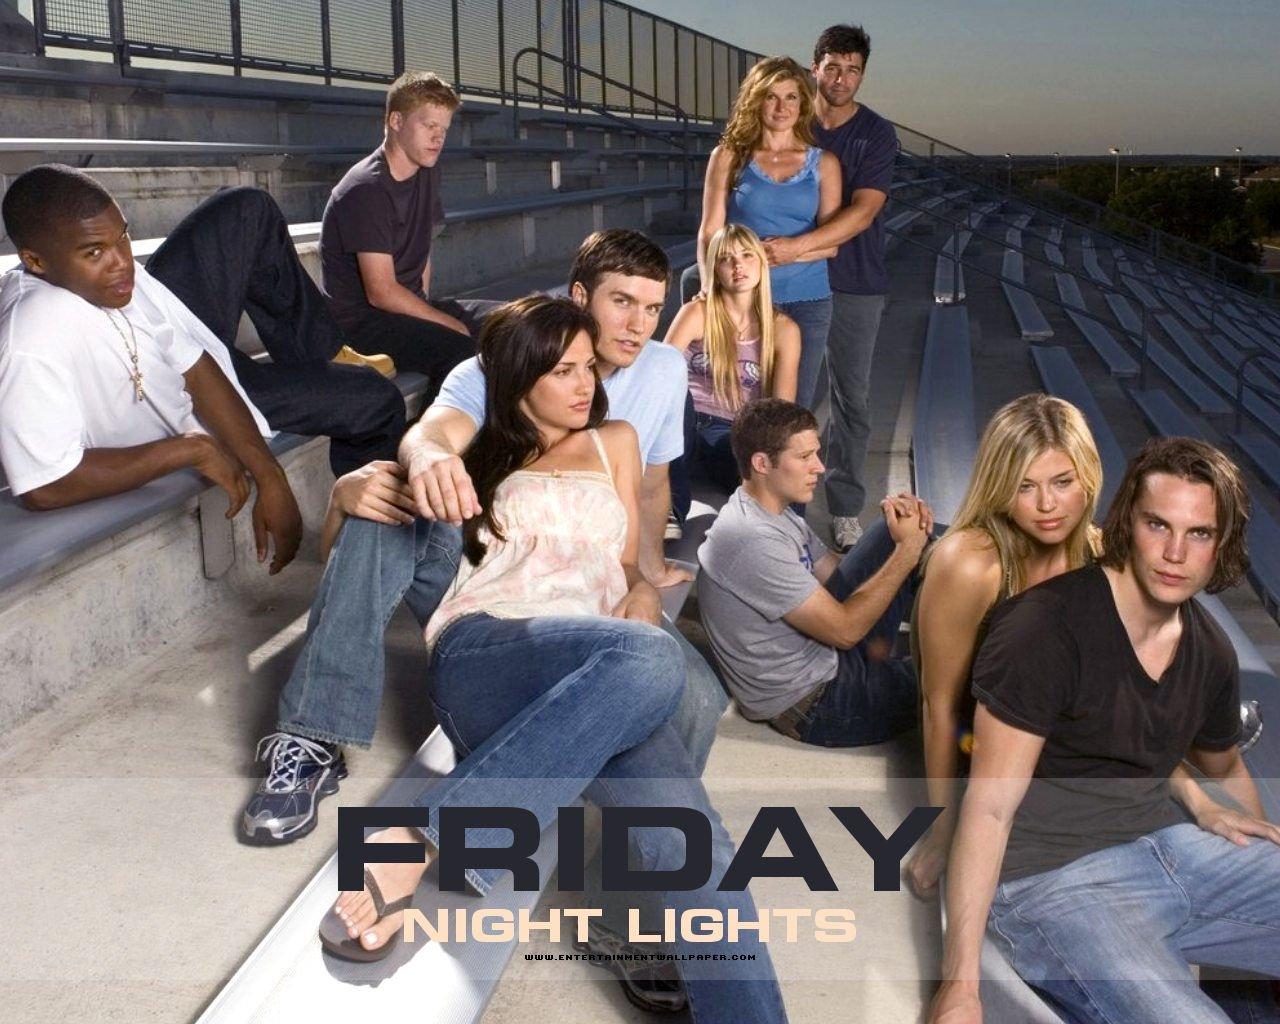 Friday Night Lights Wallpaper 1280x1024 1280x1024